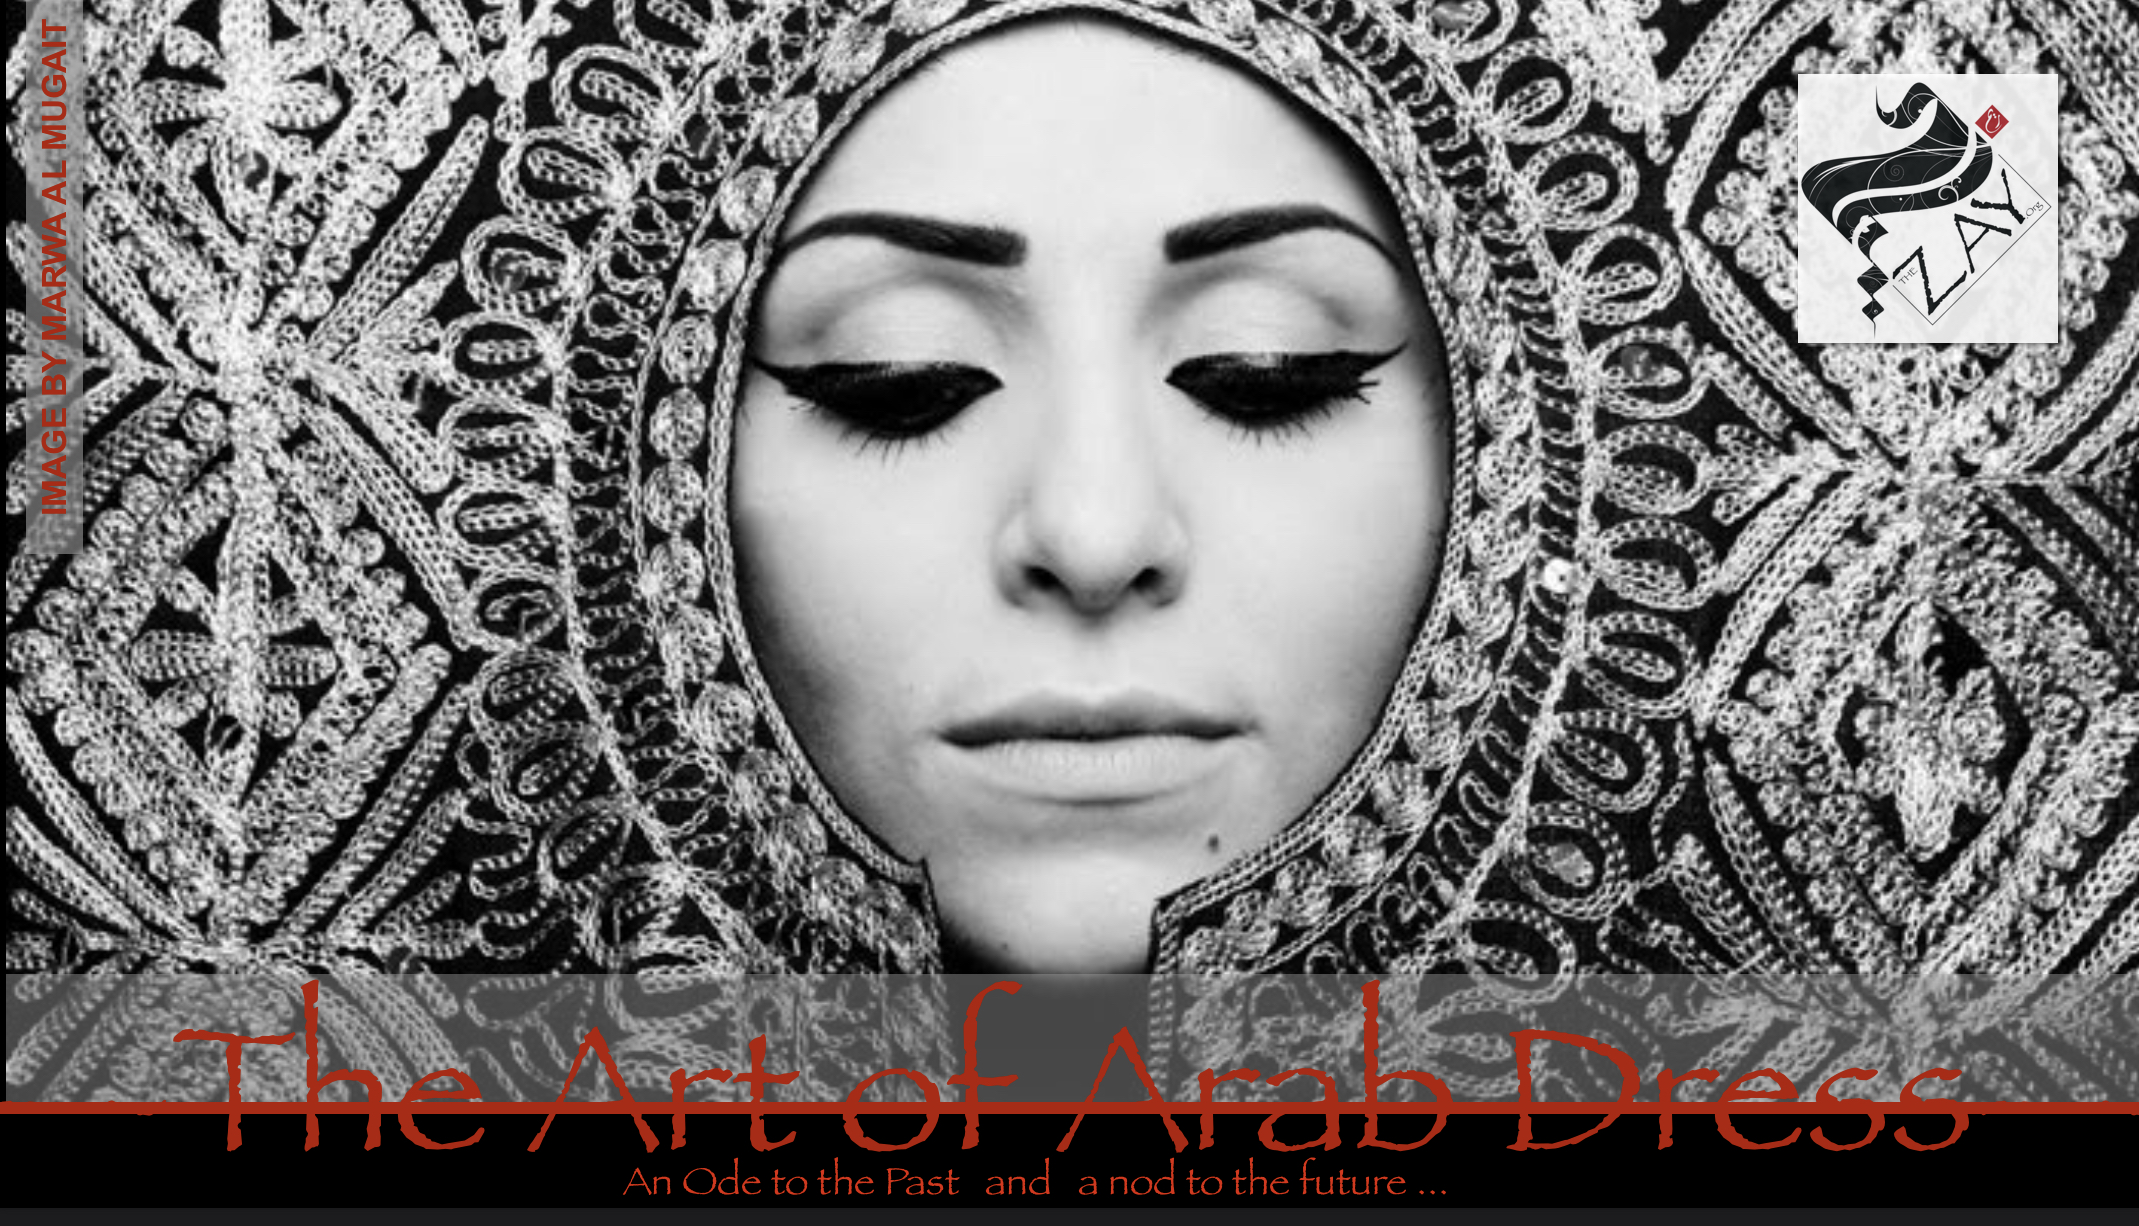 The Art of Arab Dress